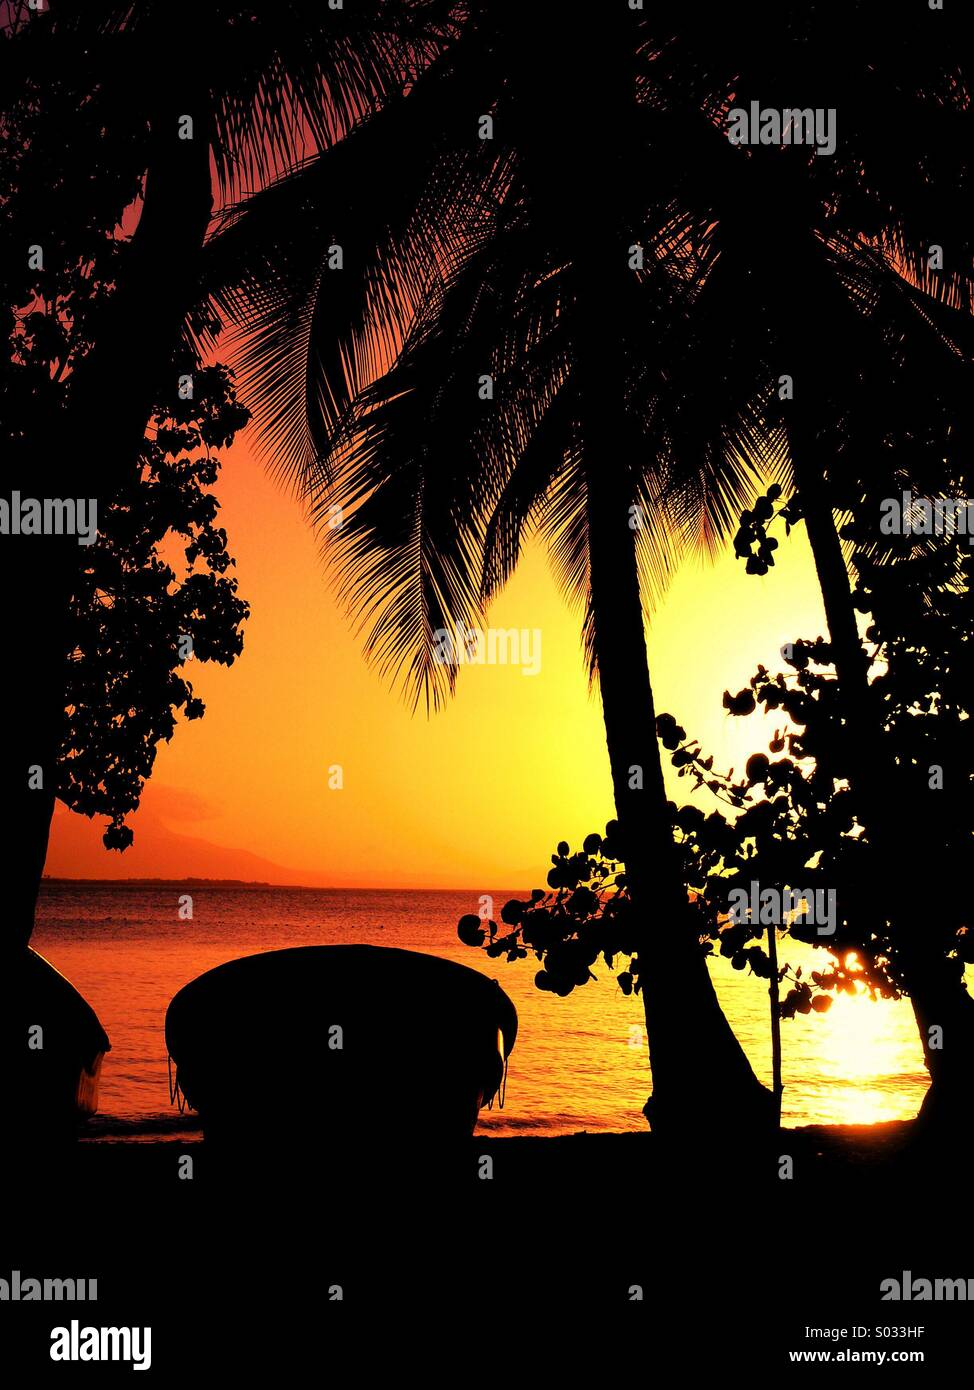 caribbean-sunset-beach-boat-S033HF.jpg